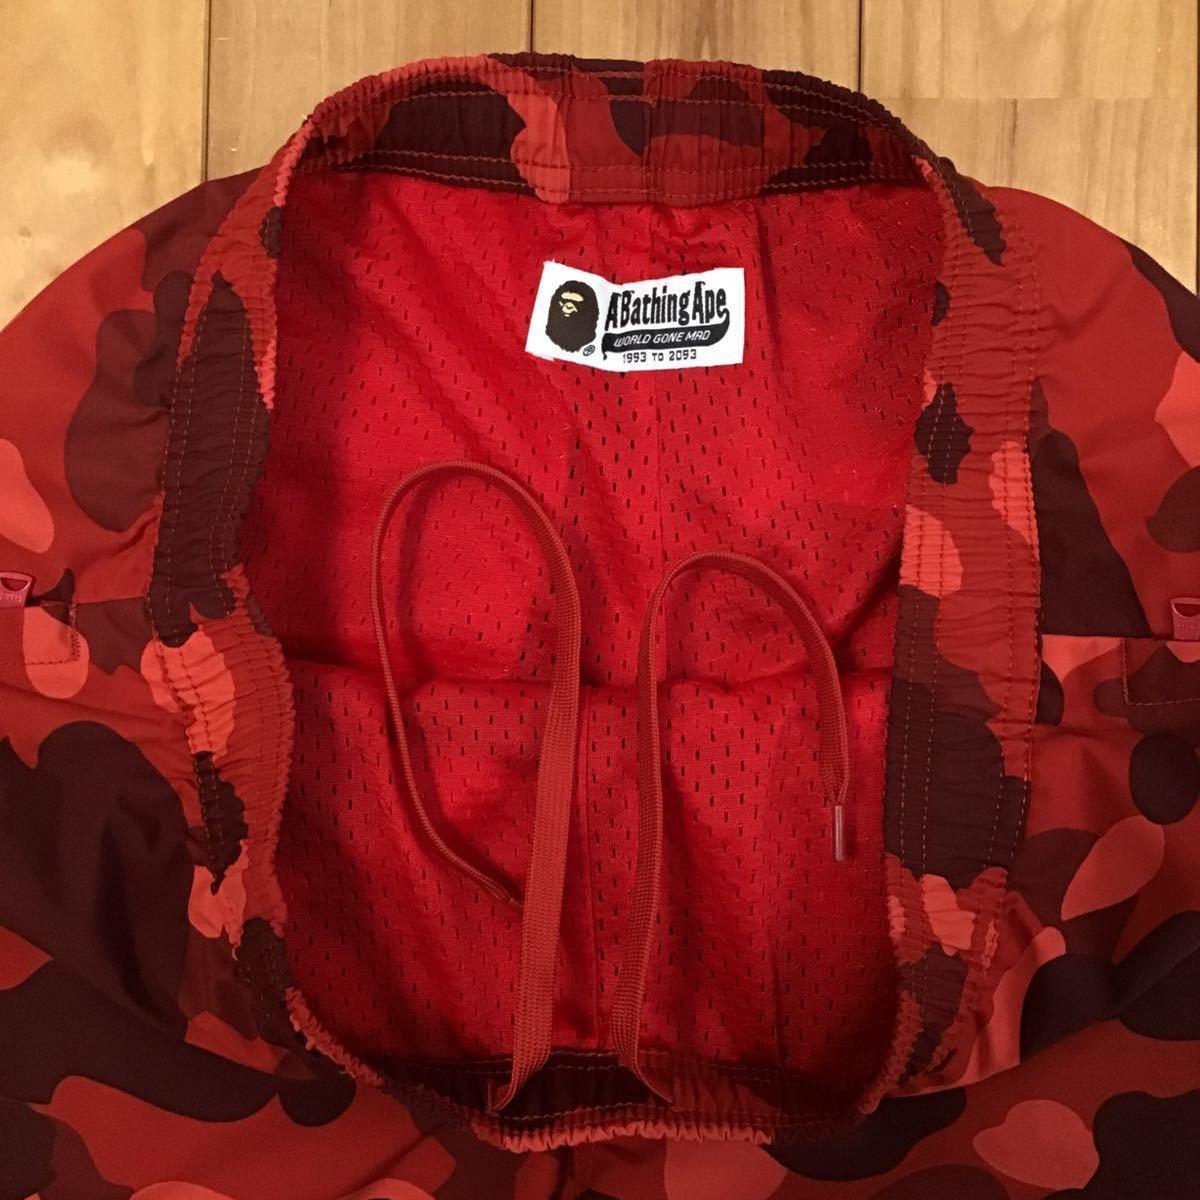 Red camo シャーク ハーフパンツ Lサイズ a bathing ape BAPE side shark shorts ショーツ エイプ ベイプ アベイシングエイプ 迷彩 25dy